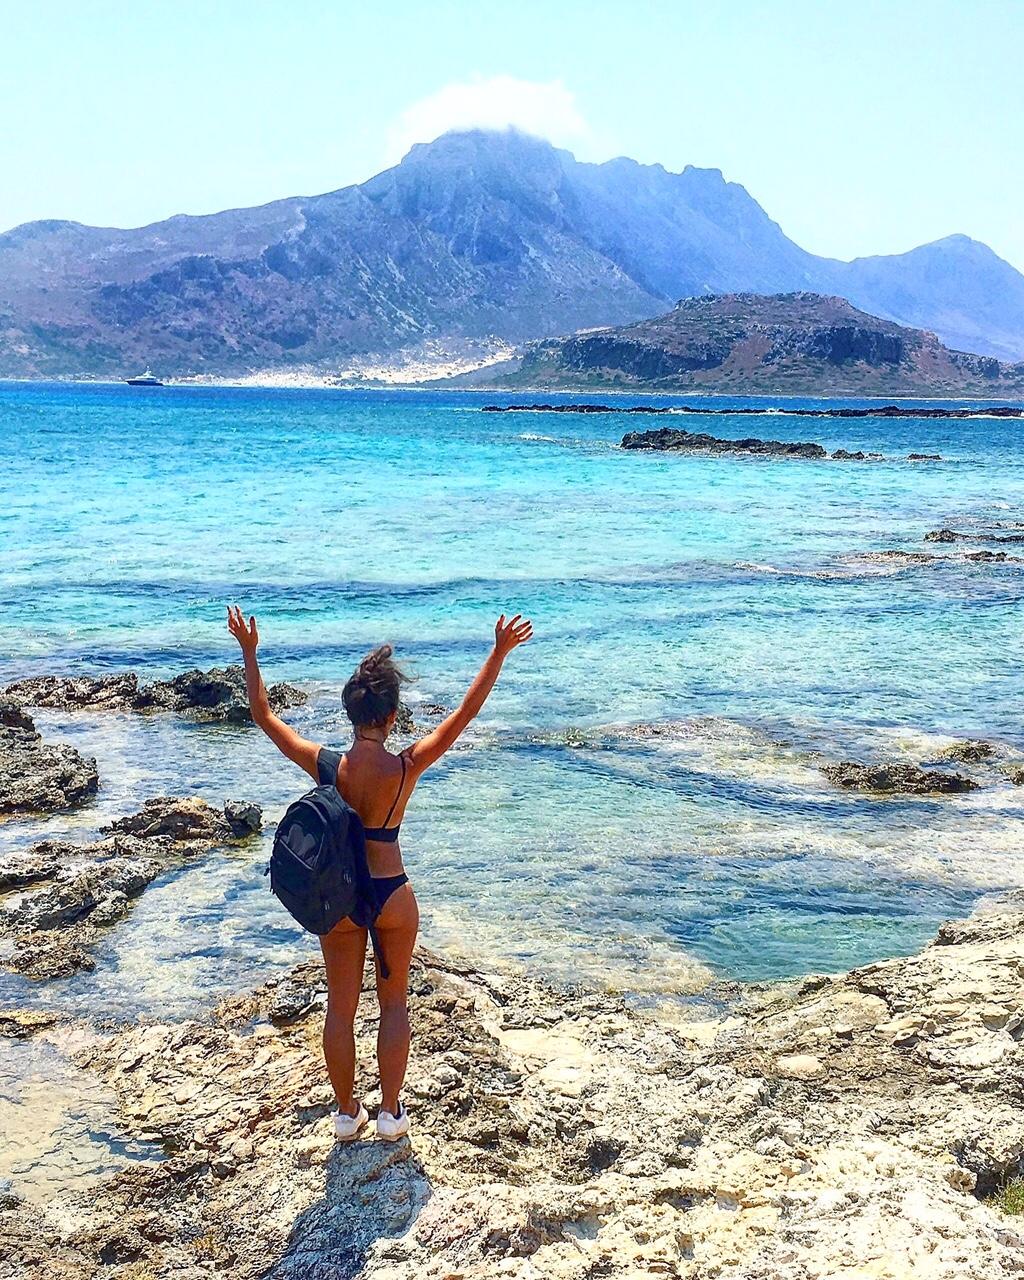 Balos2_Crete CRETE- THE BEST OF THE CHANIA REGION